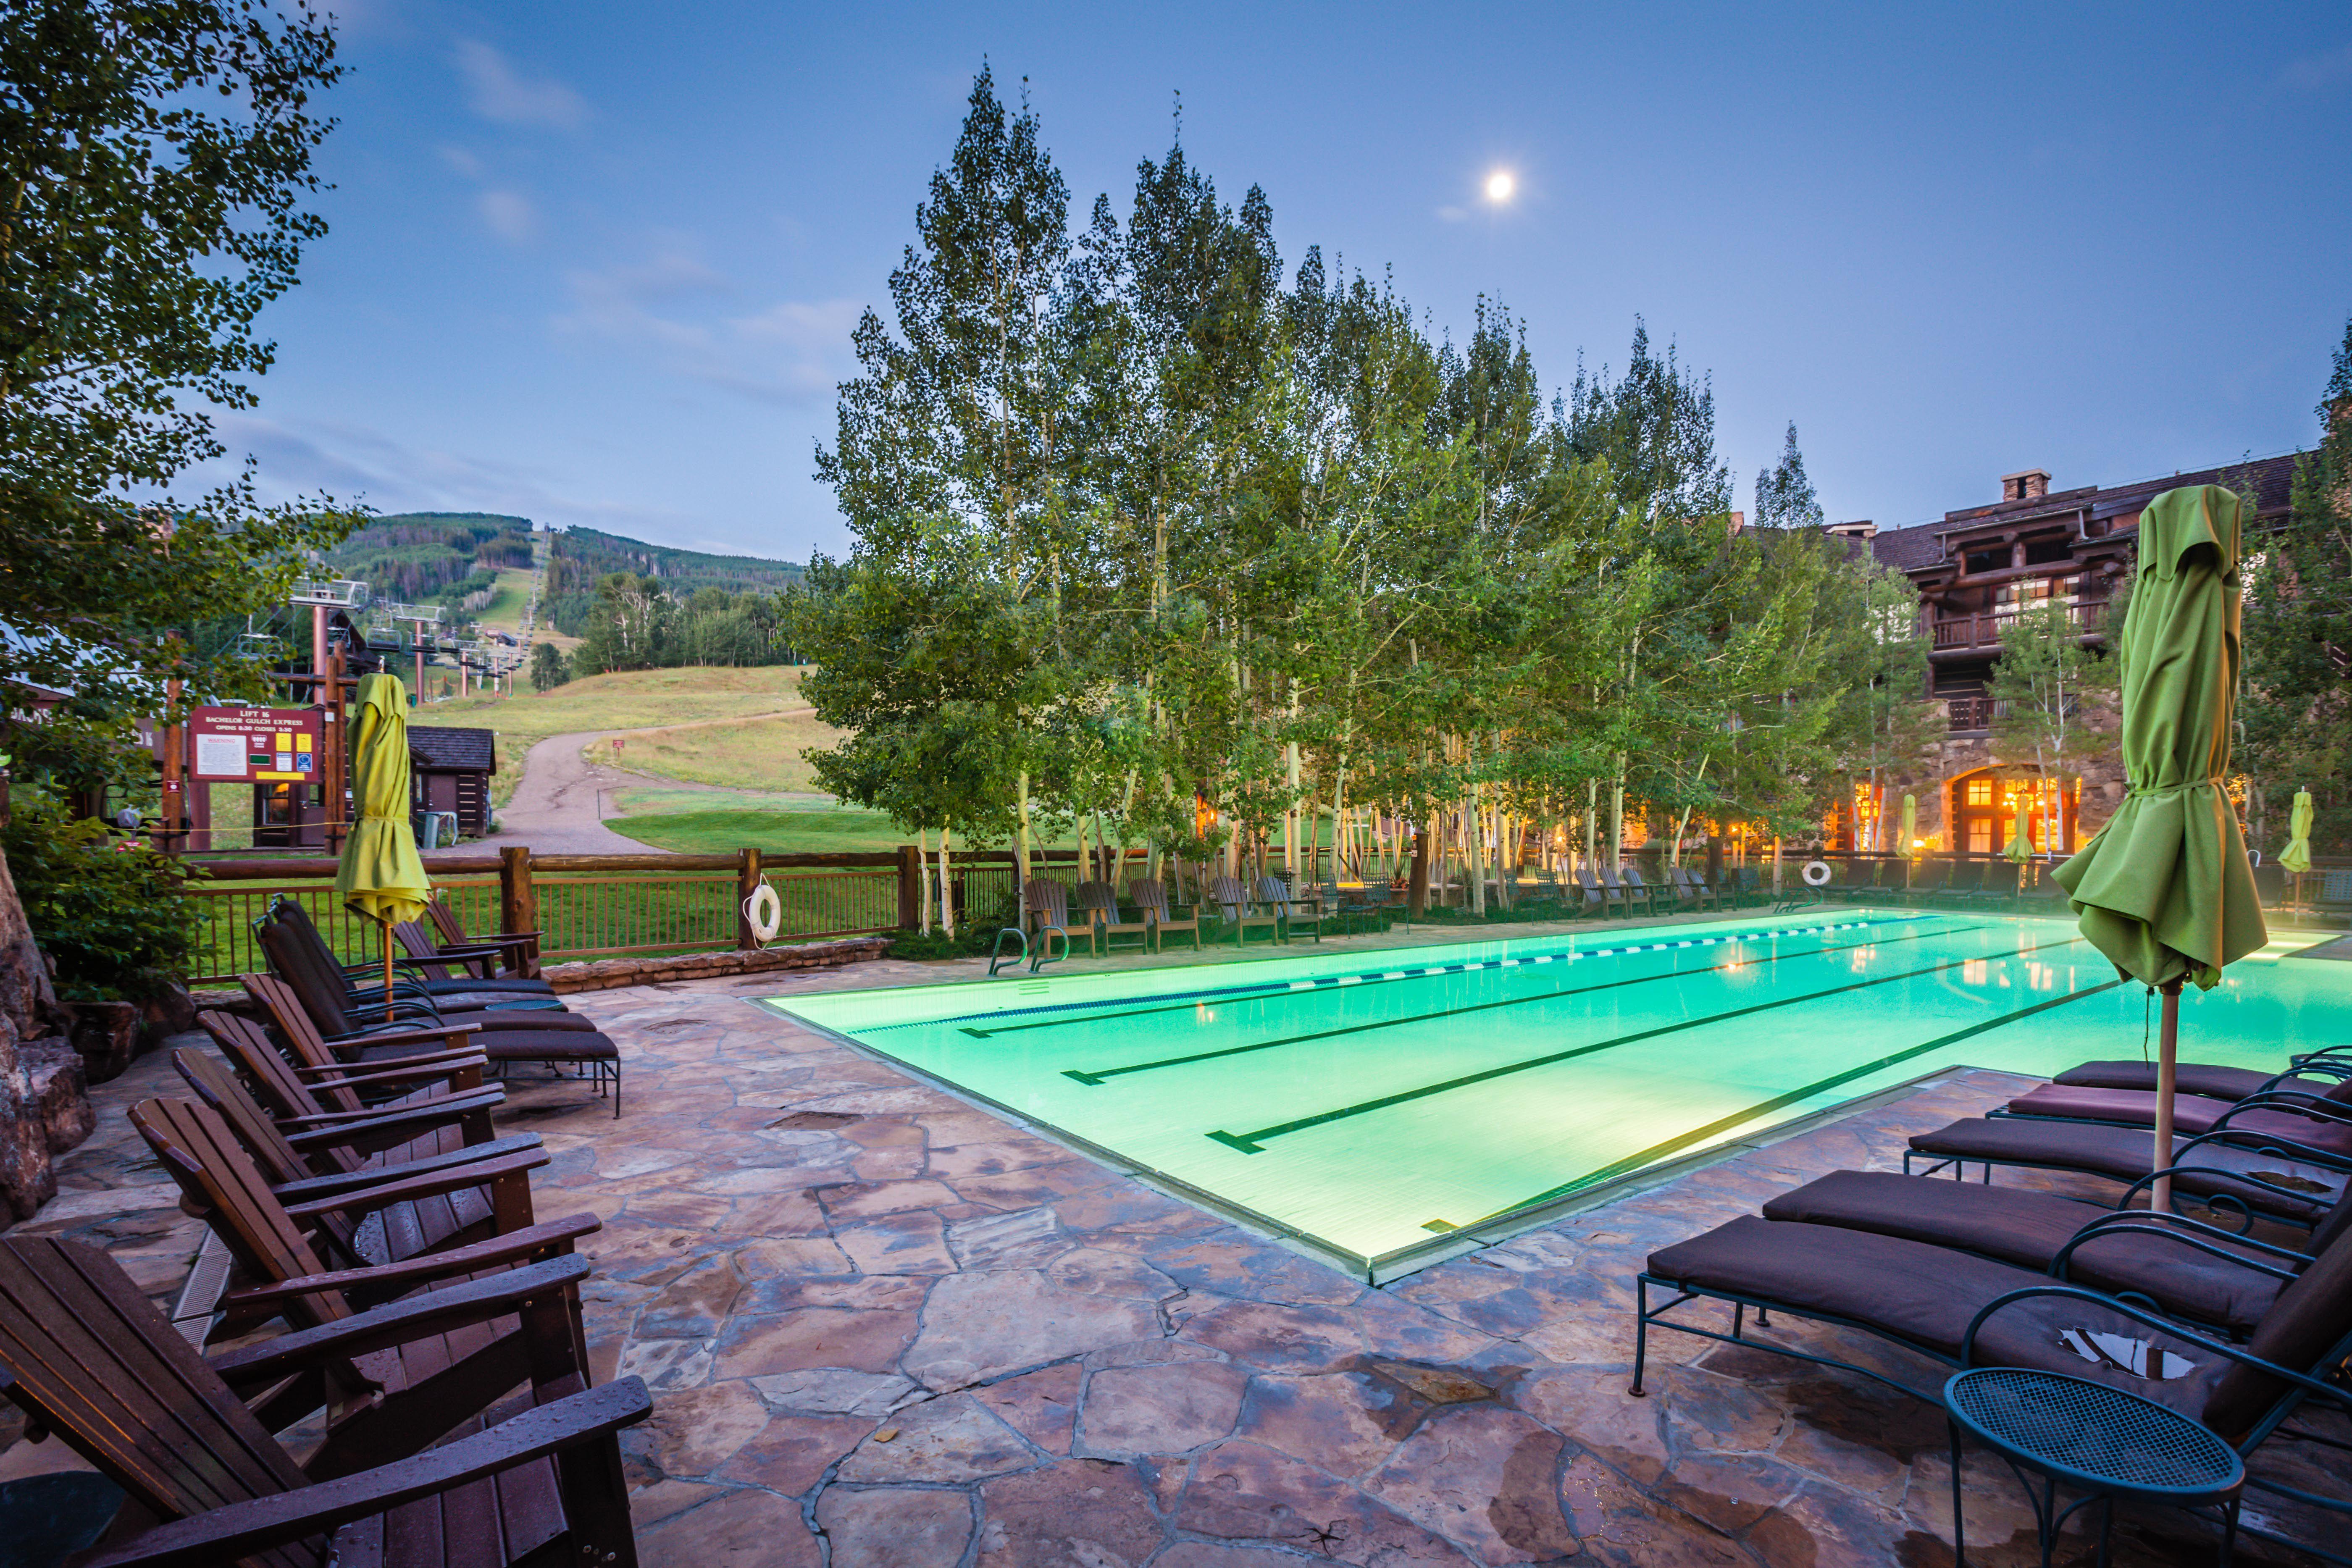 Outdoor heated lap pool at The Ritz-Carlton, Bachelor Gulch in Beaver Creek Colorado